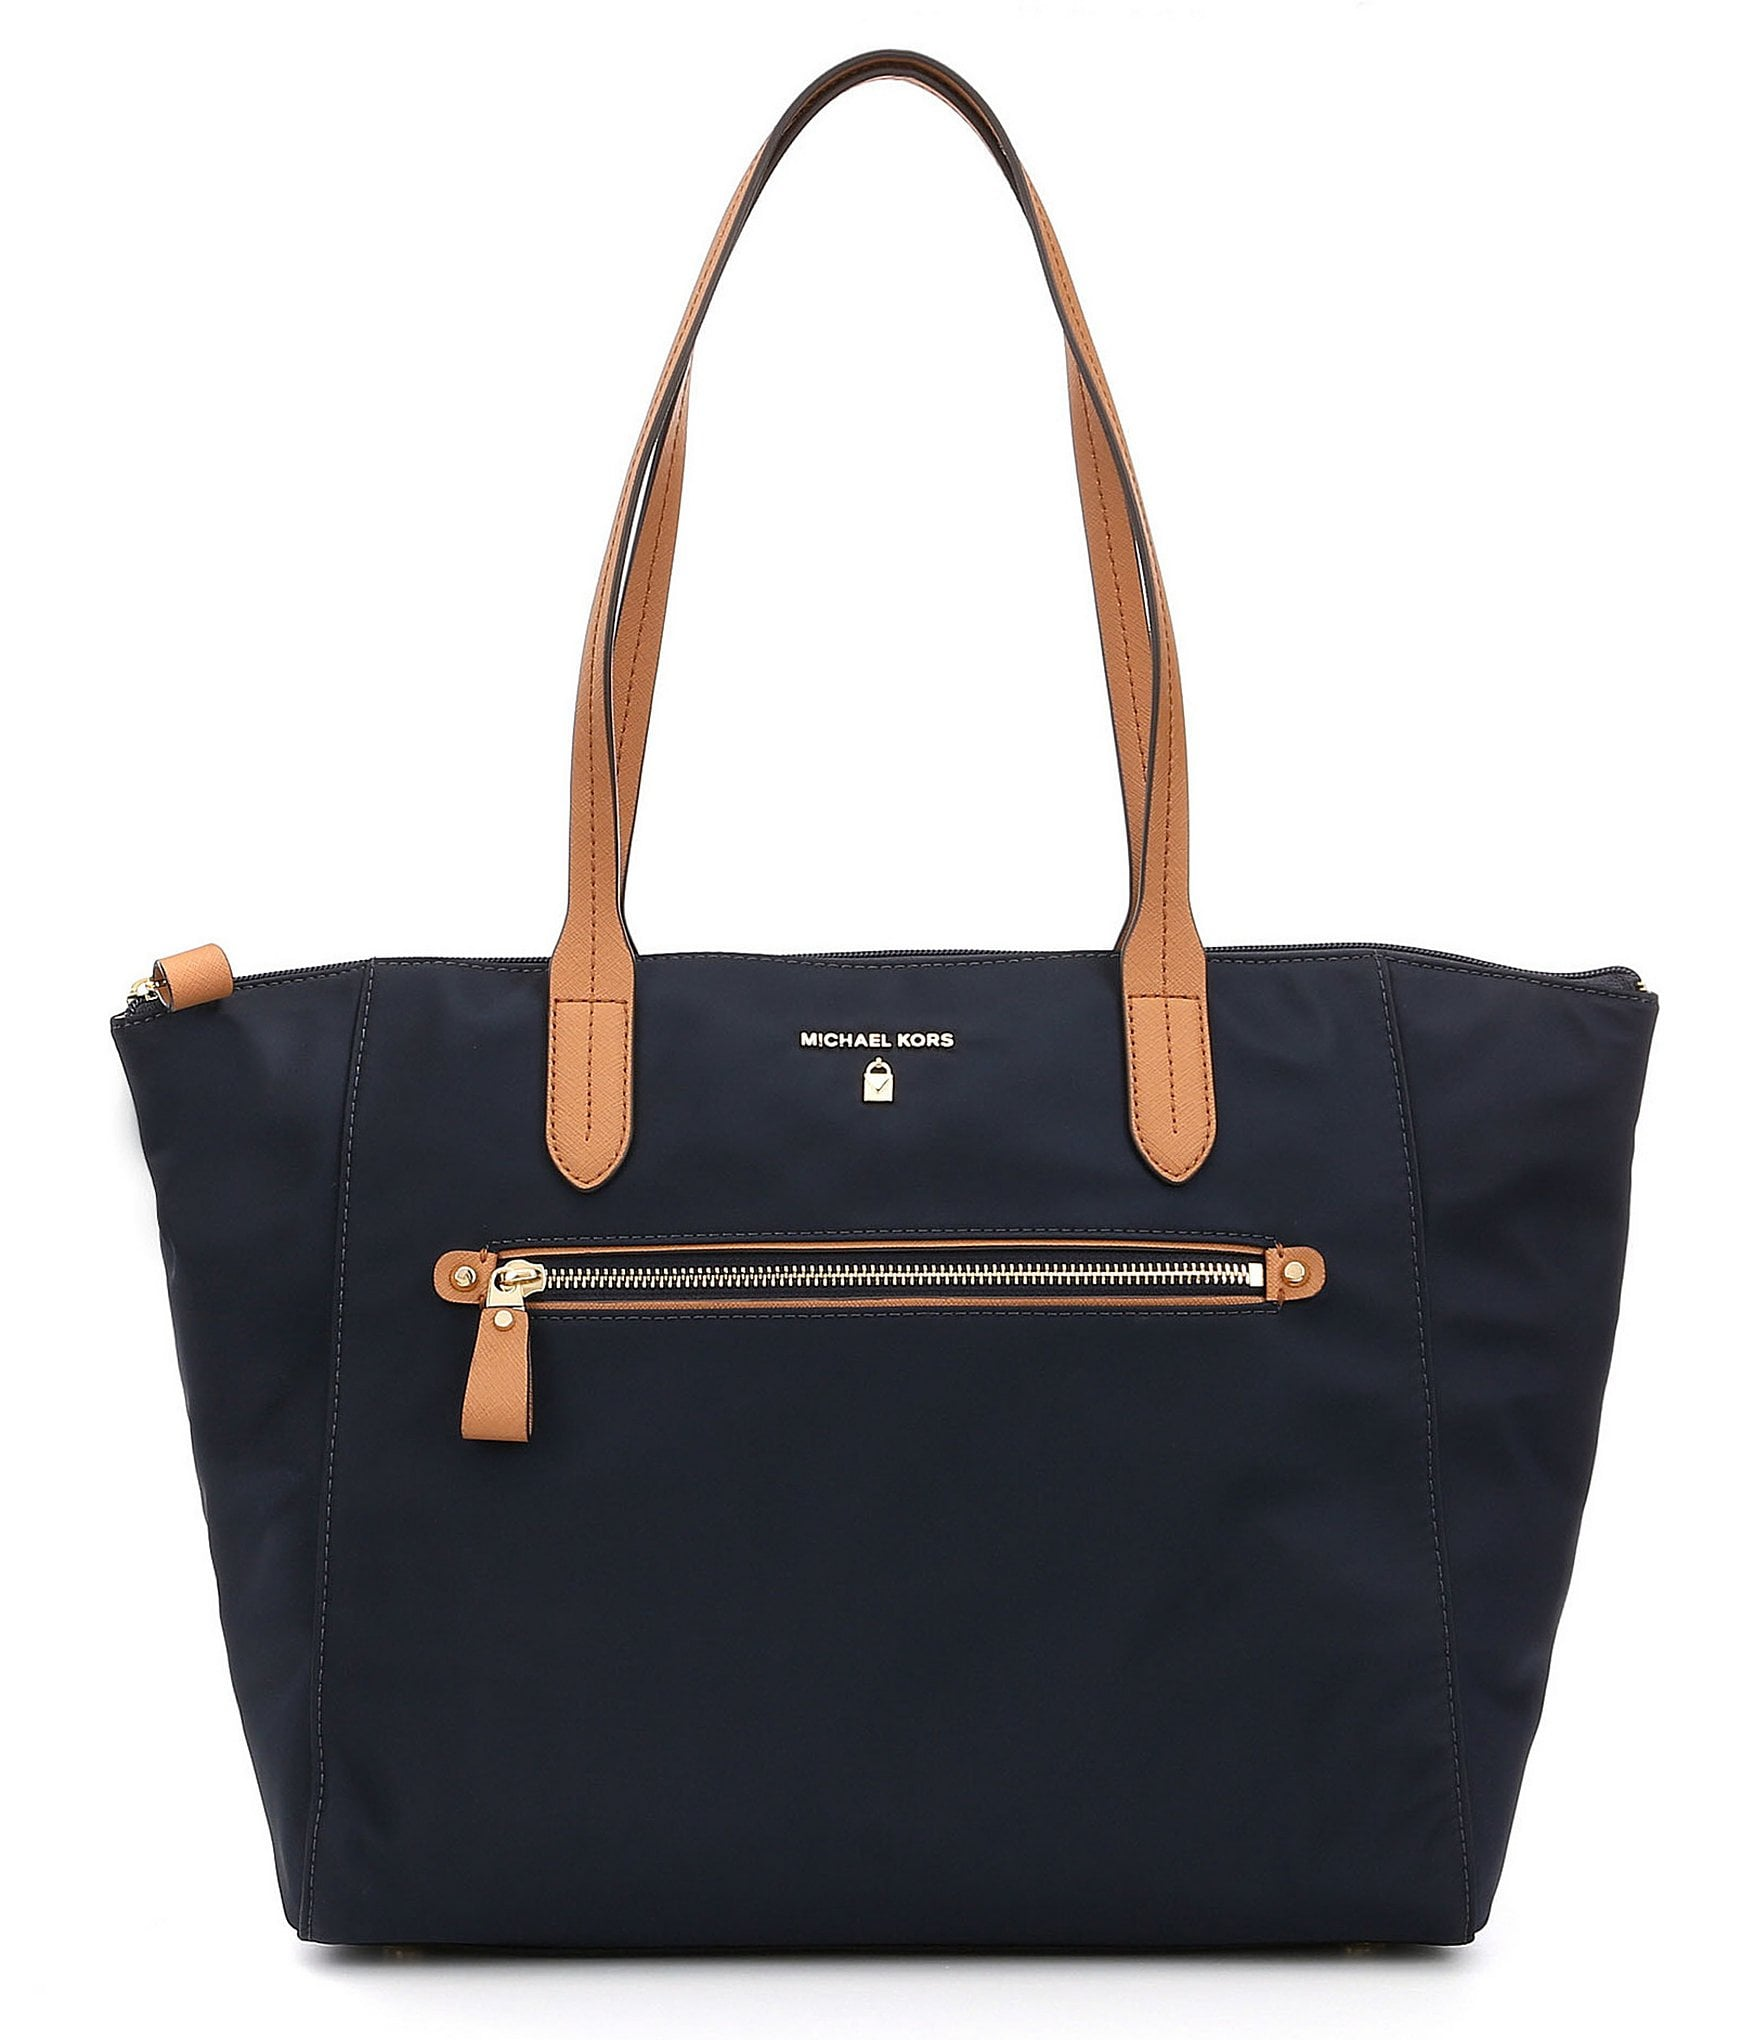 michael kors handbags at dillards michael kors large black backpack